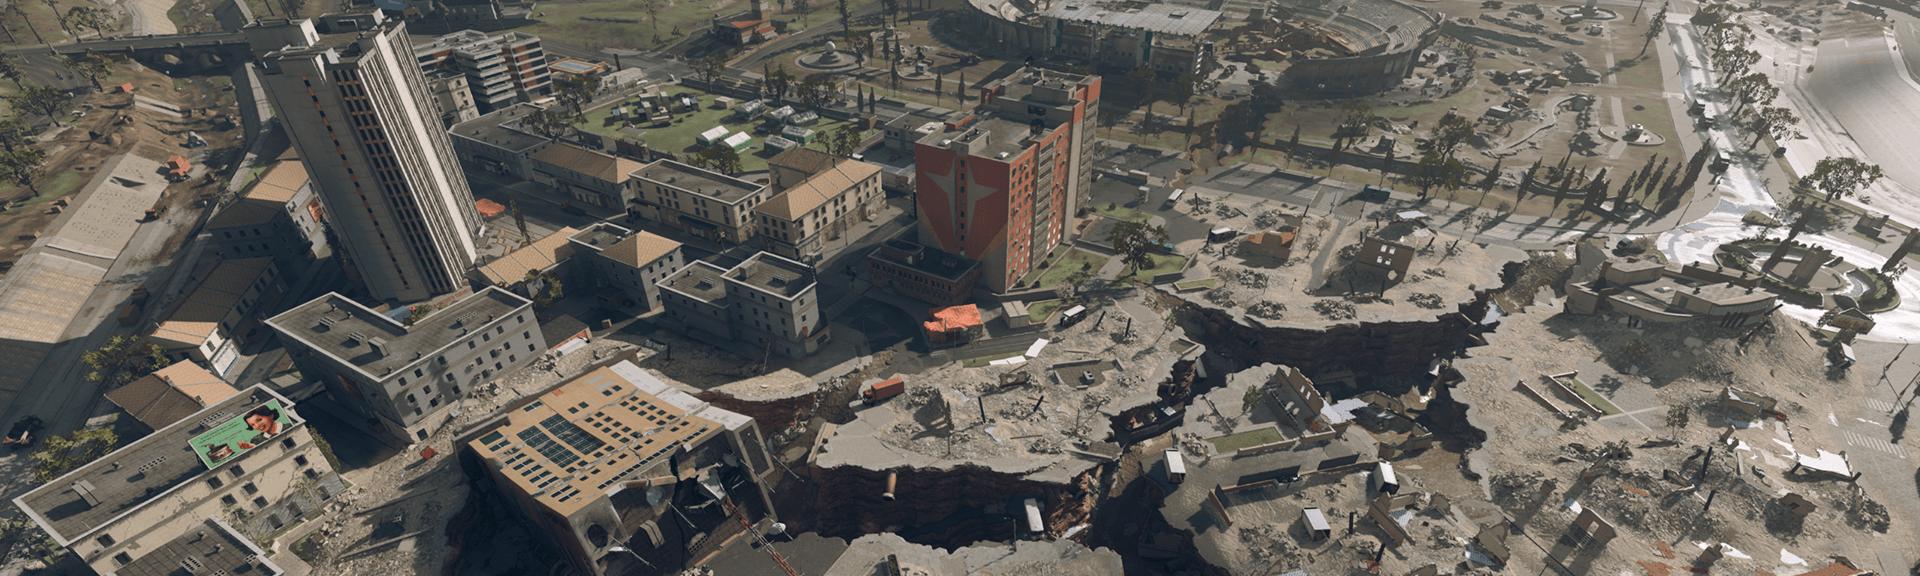 Seismic event rips hole through downtown Verdansk